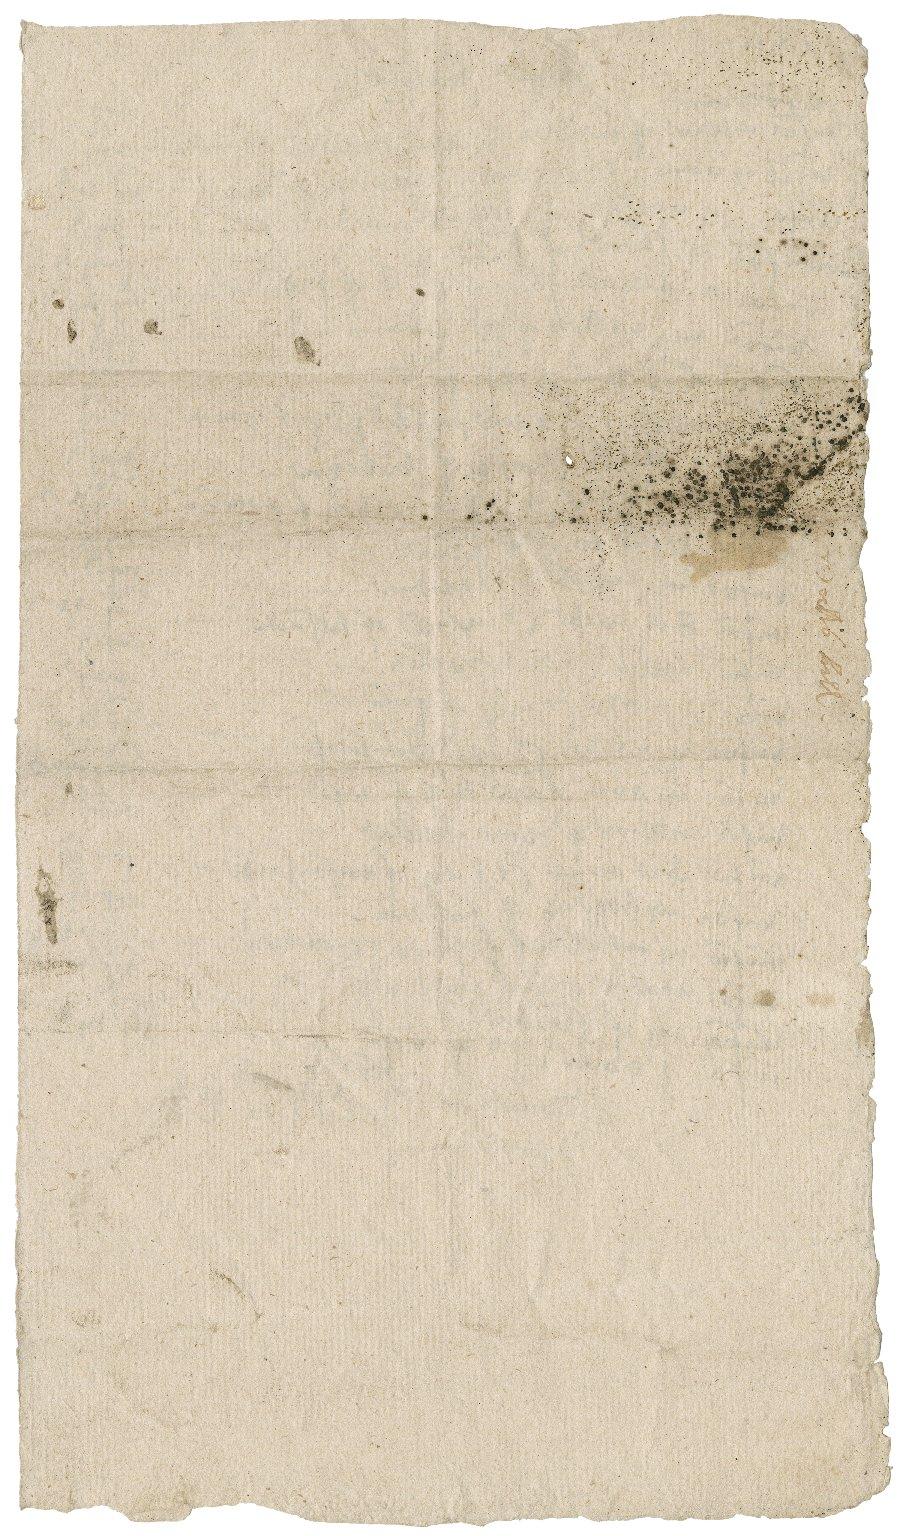 A mercer's or silkman's bill / by unidentified Bacon